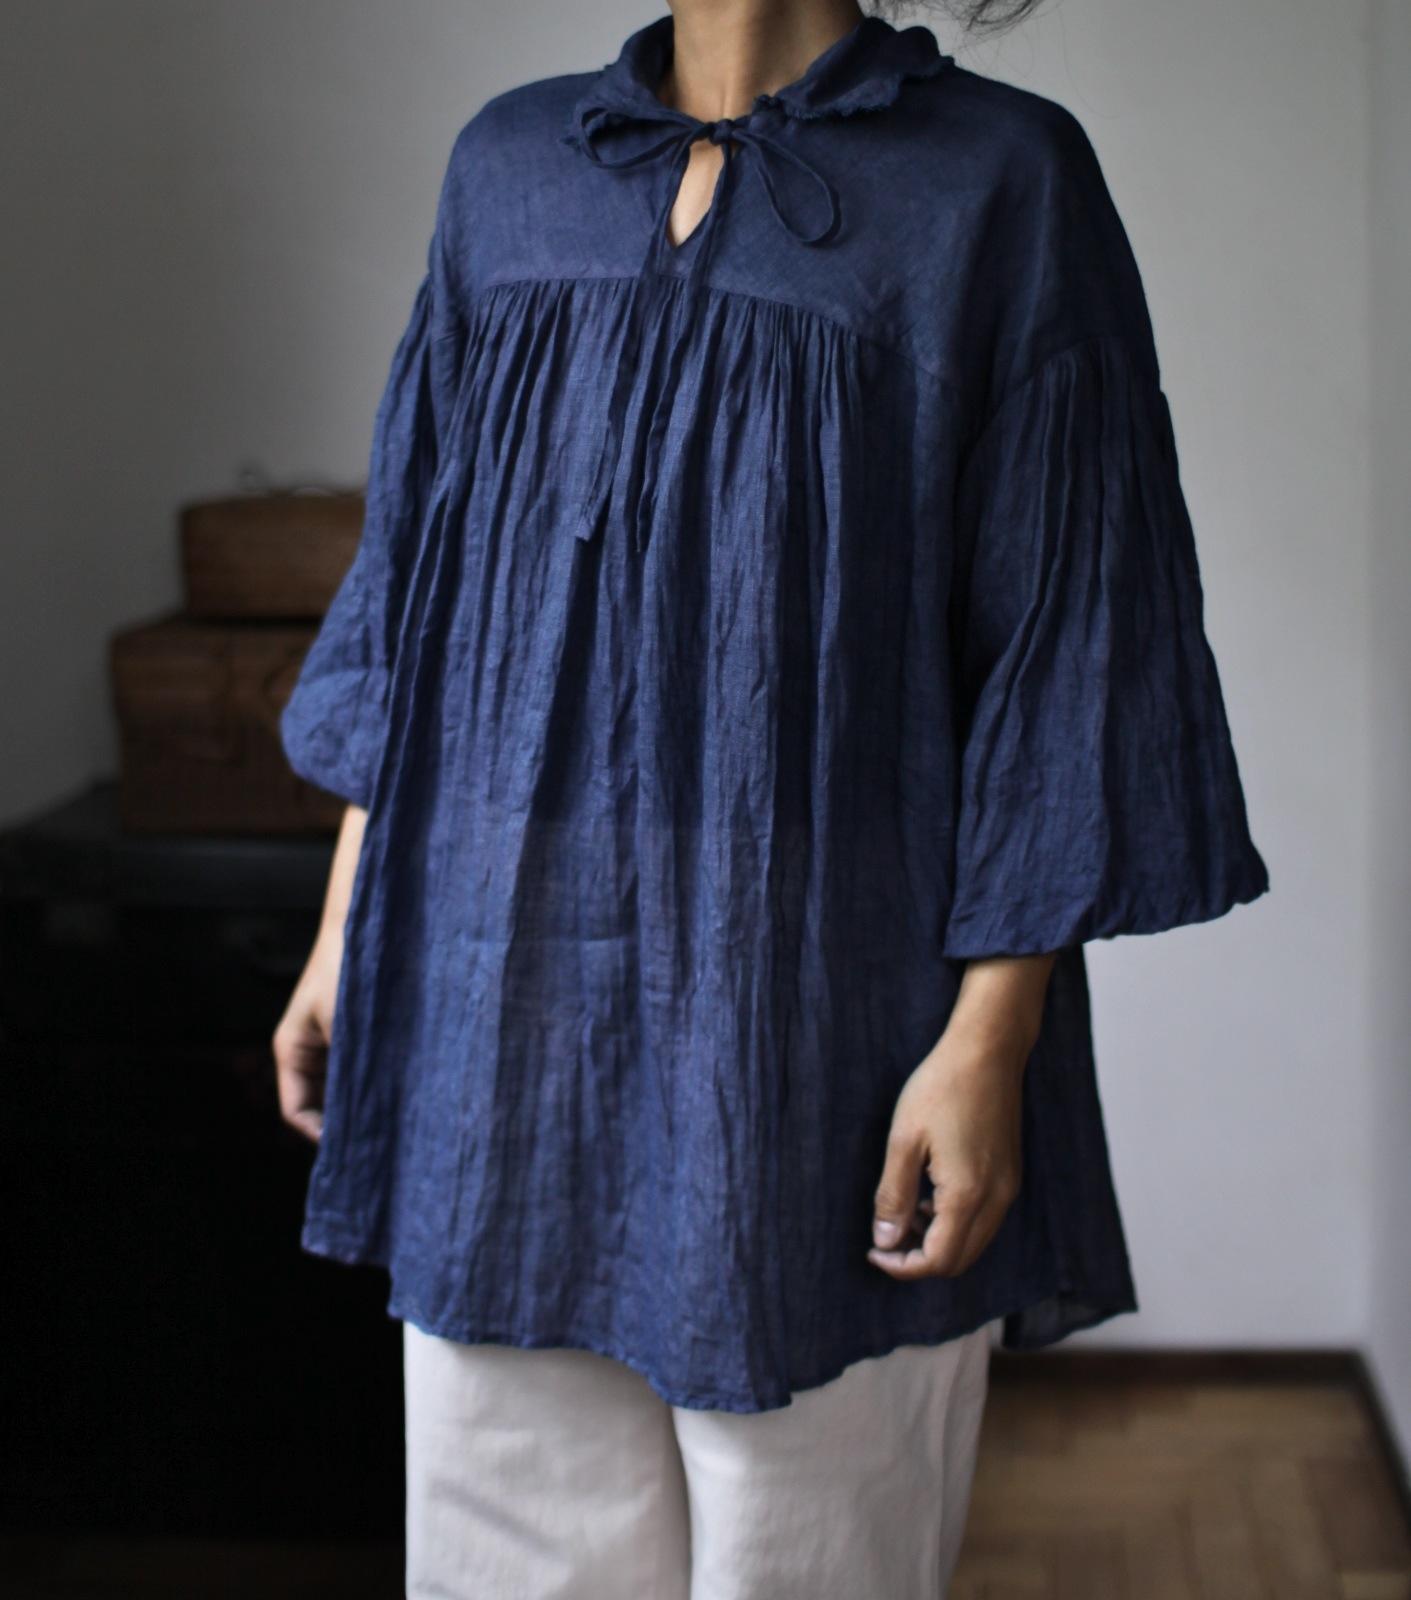 2015 Spring/Summer リネンシングルガーゼのブラウス Linen gauze blouse(B-1531)瑠璃